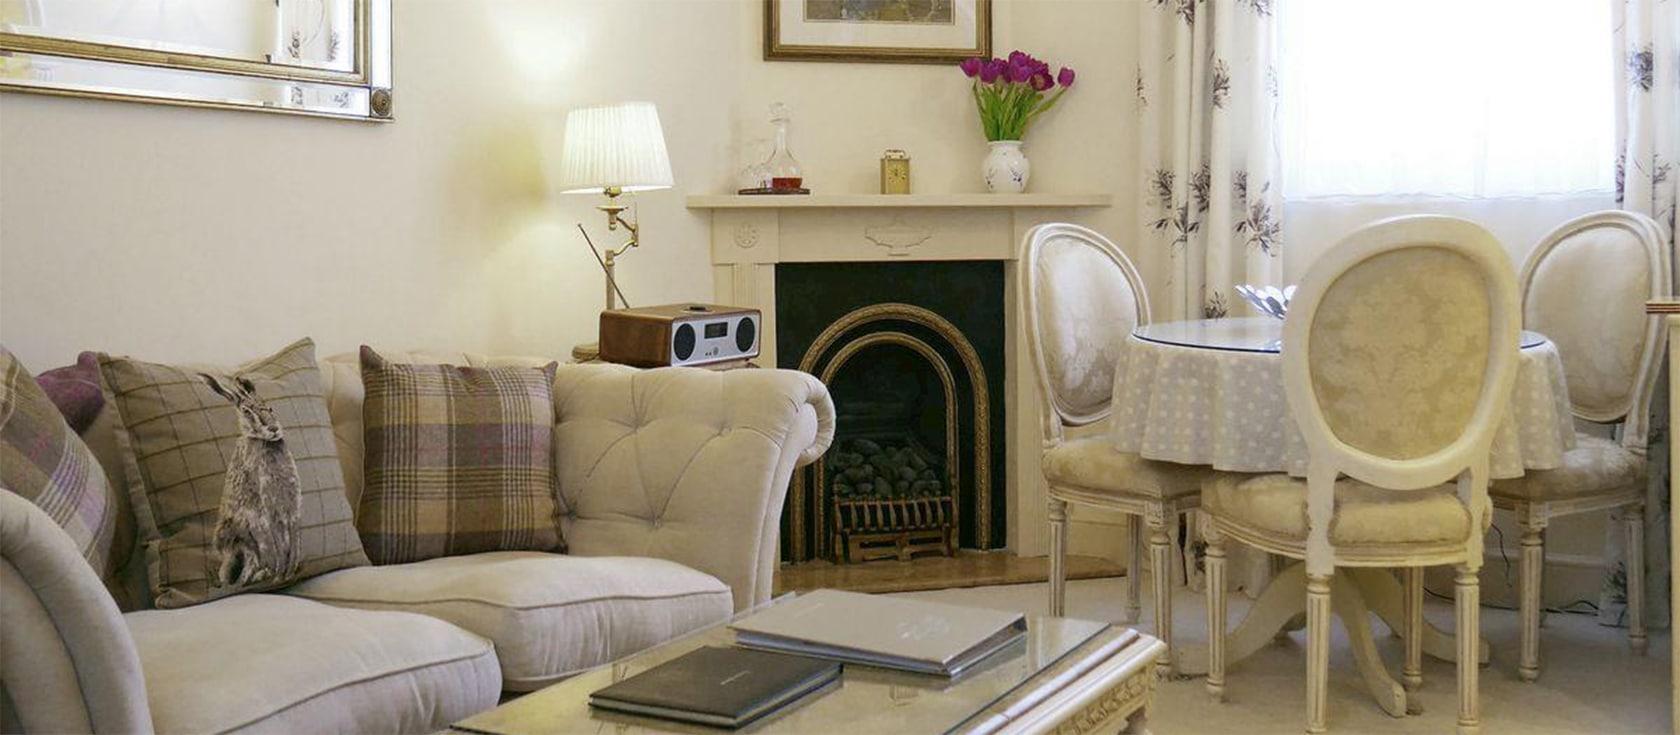 The Regency Apartment, Torquay